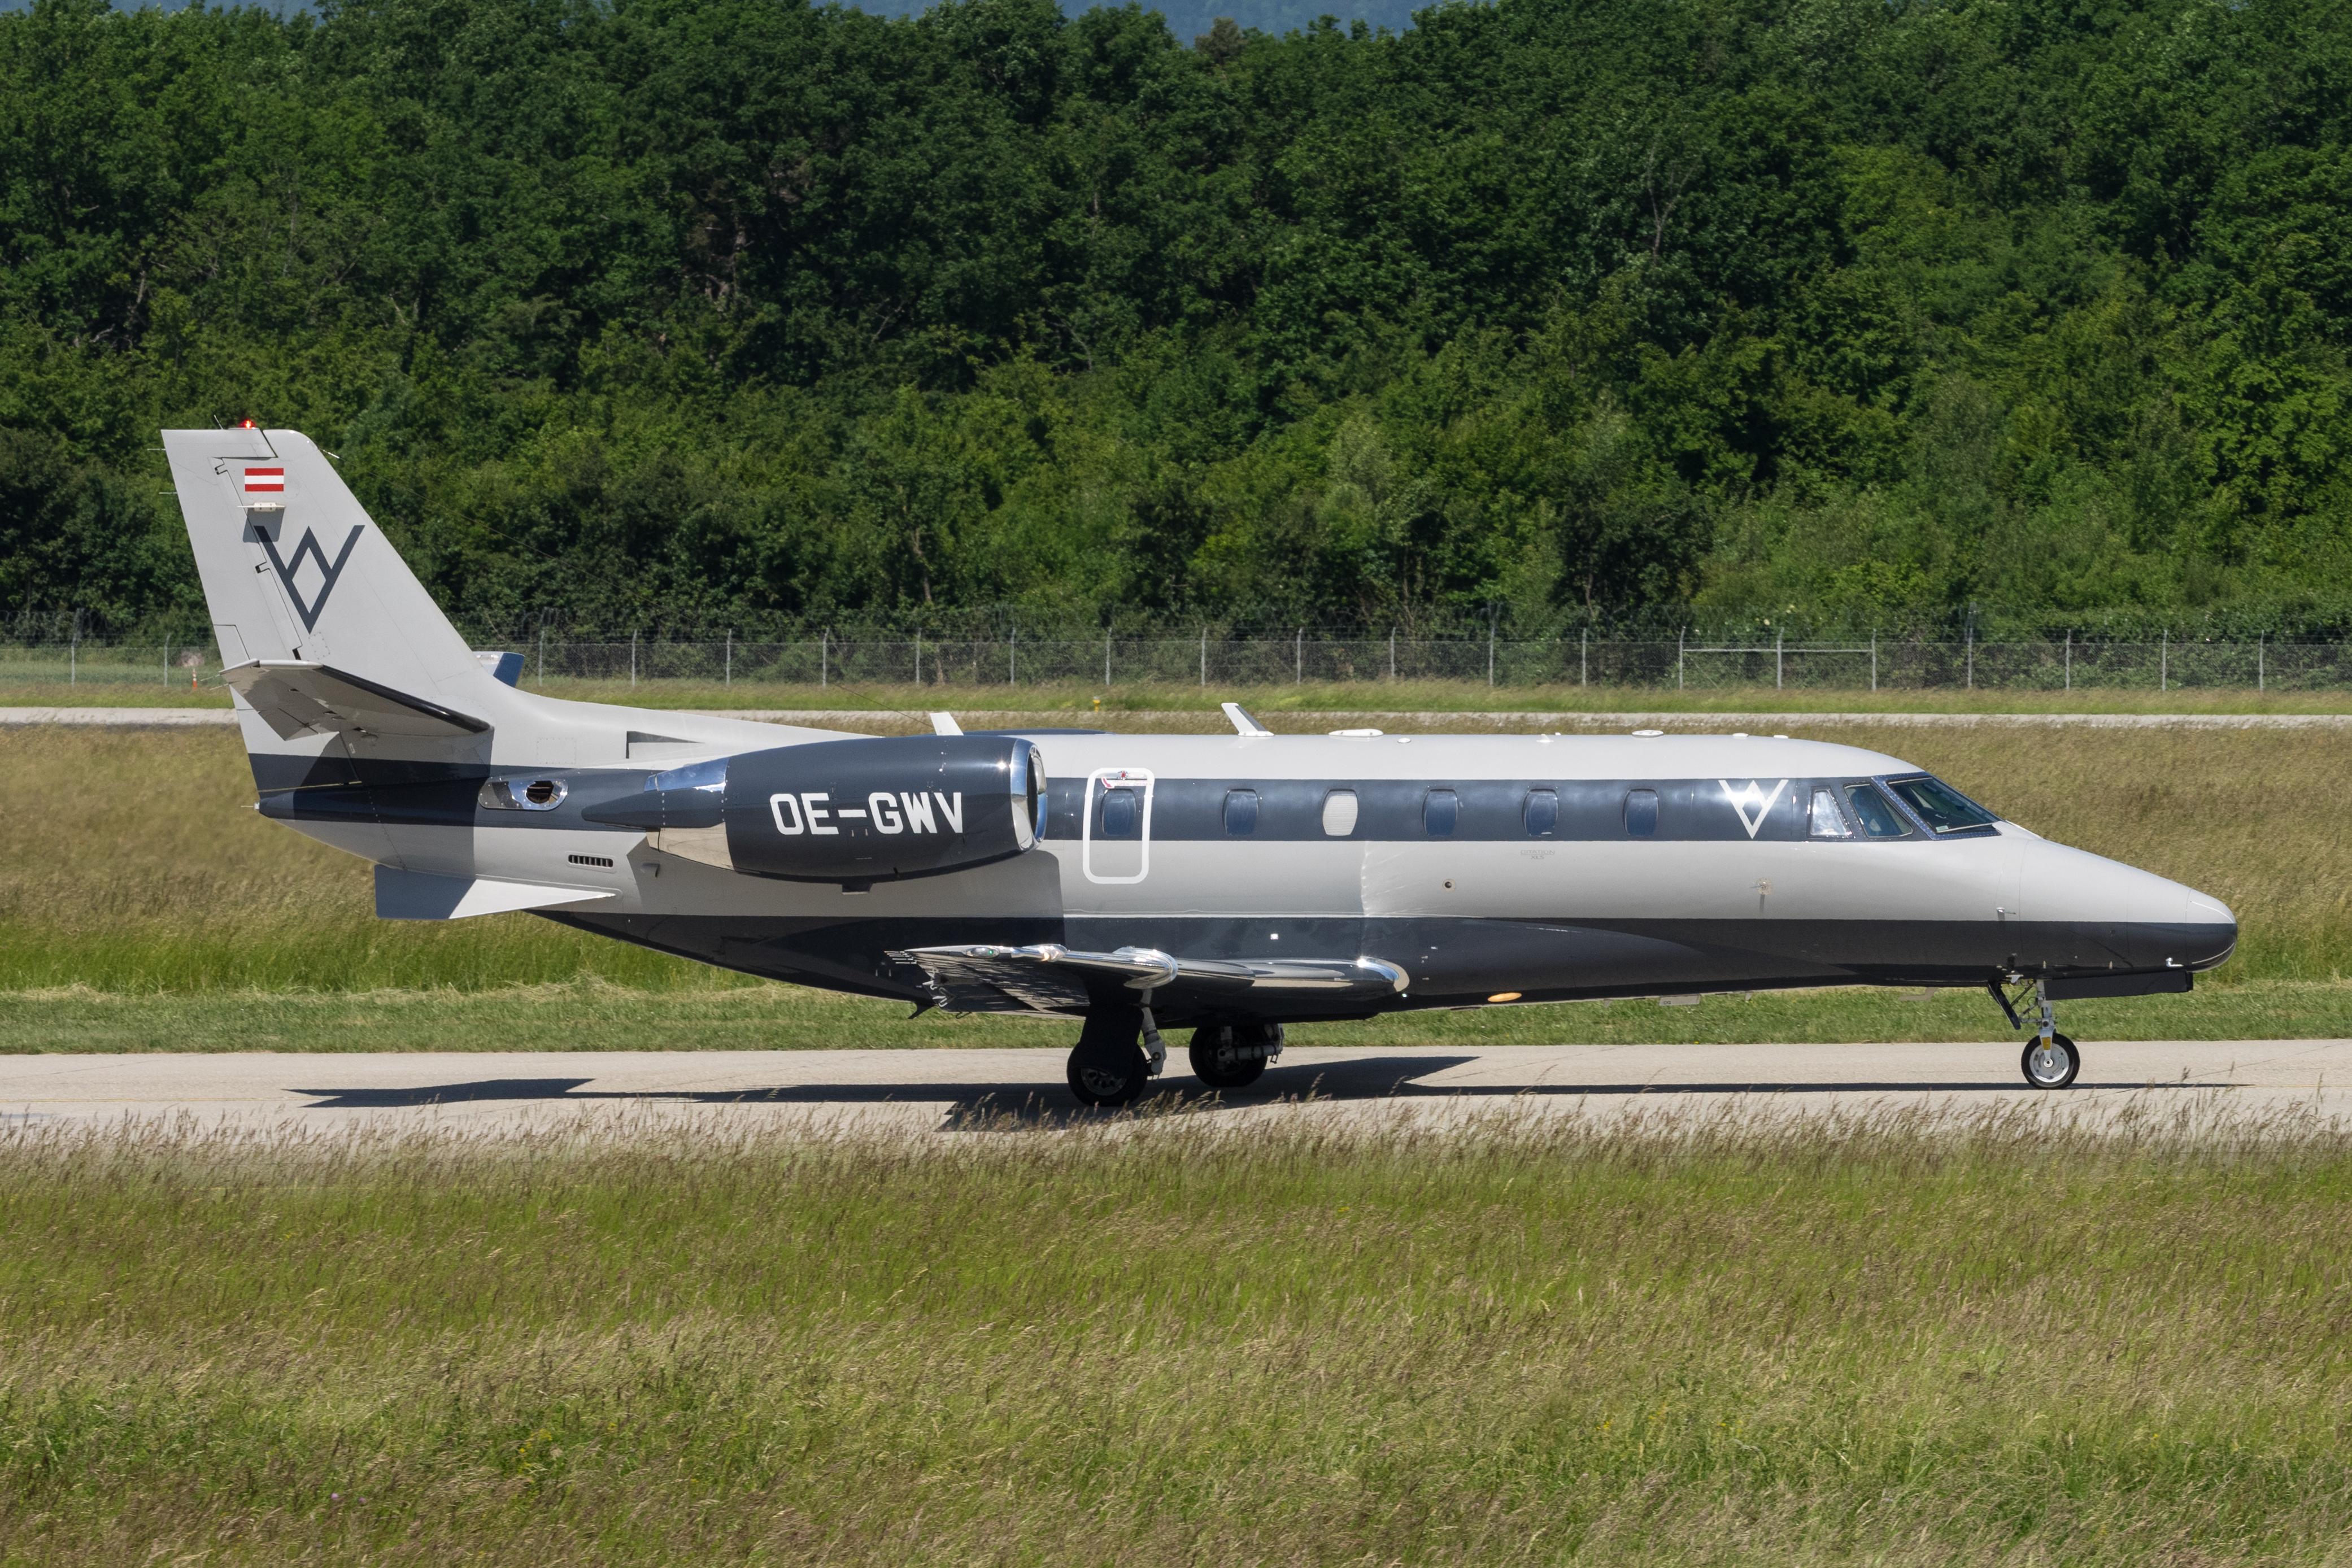 File Oe Gwv Cessna 560xl Citation Xls C56x Esq Europ Star